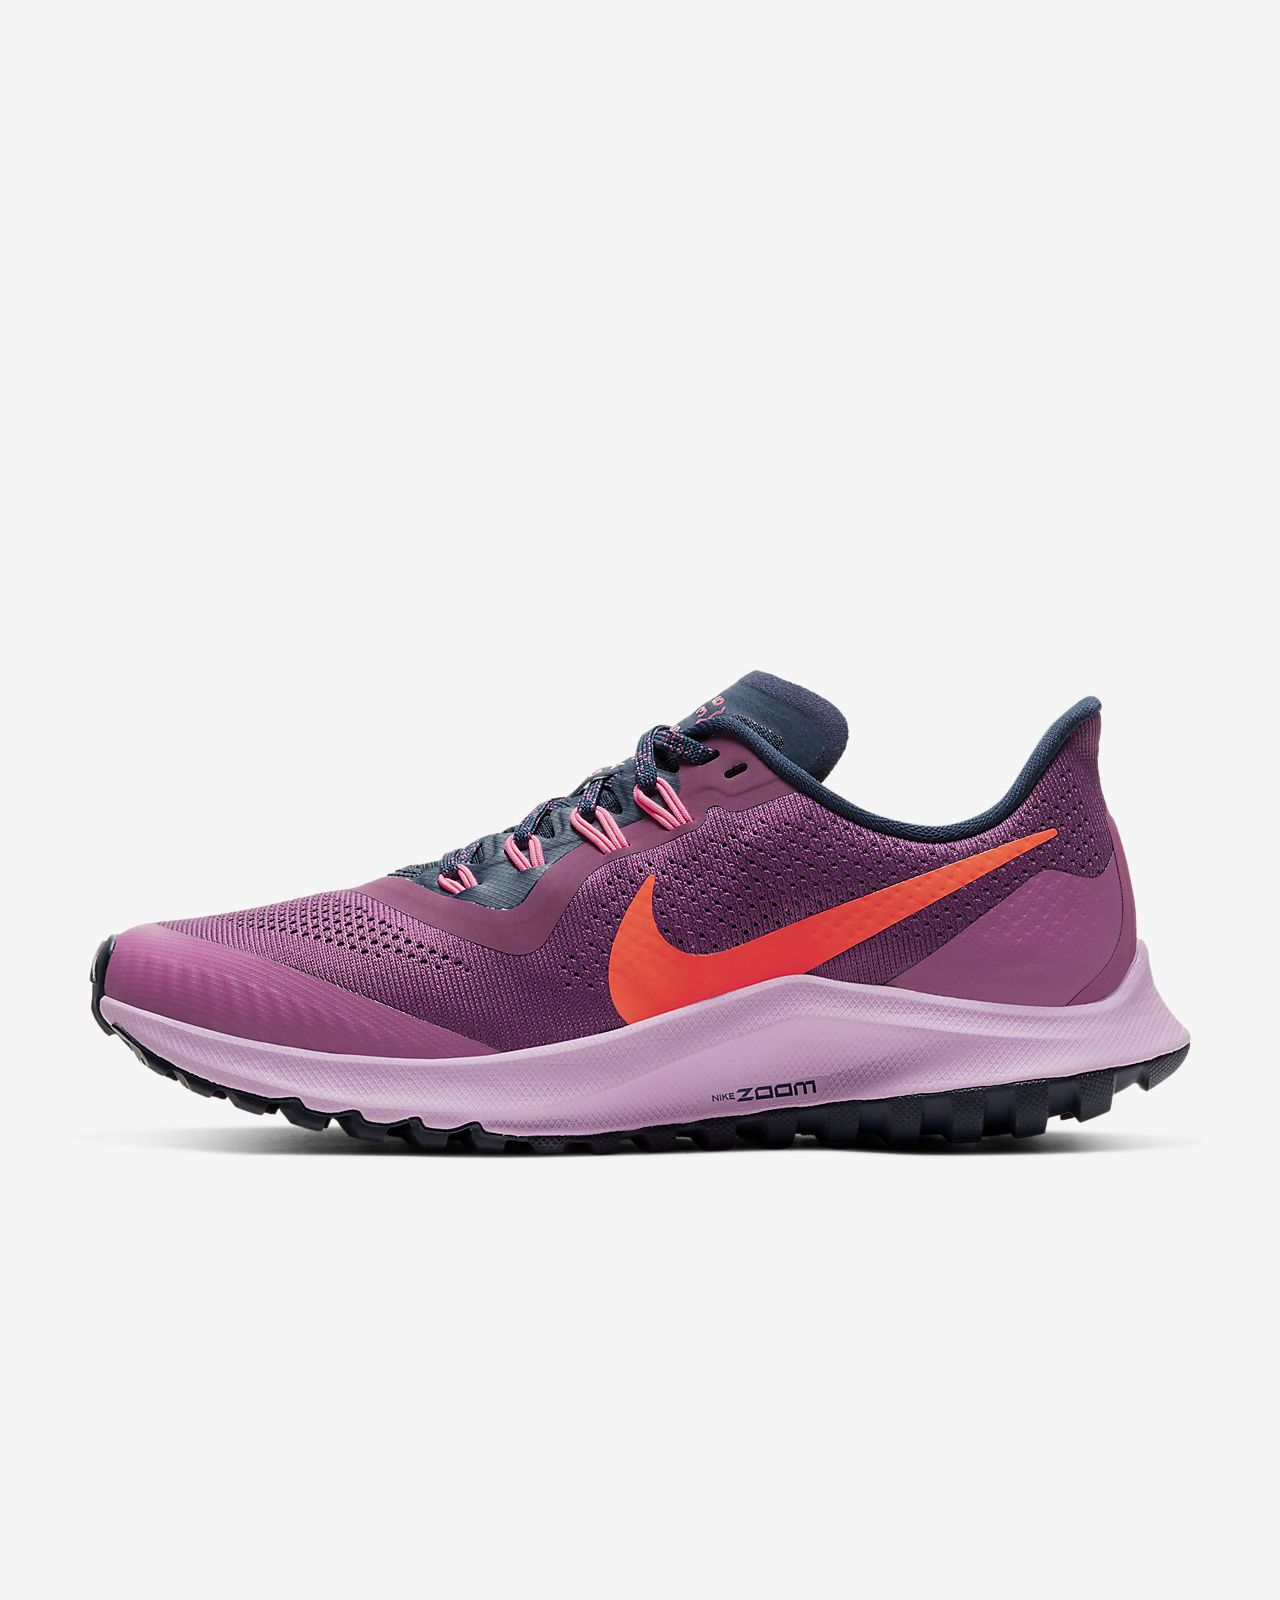 Nike Air Zoom Pegasus 36 trail per donna scarpe da corsa FA19